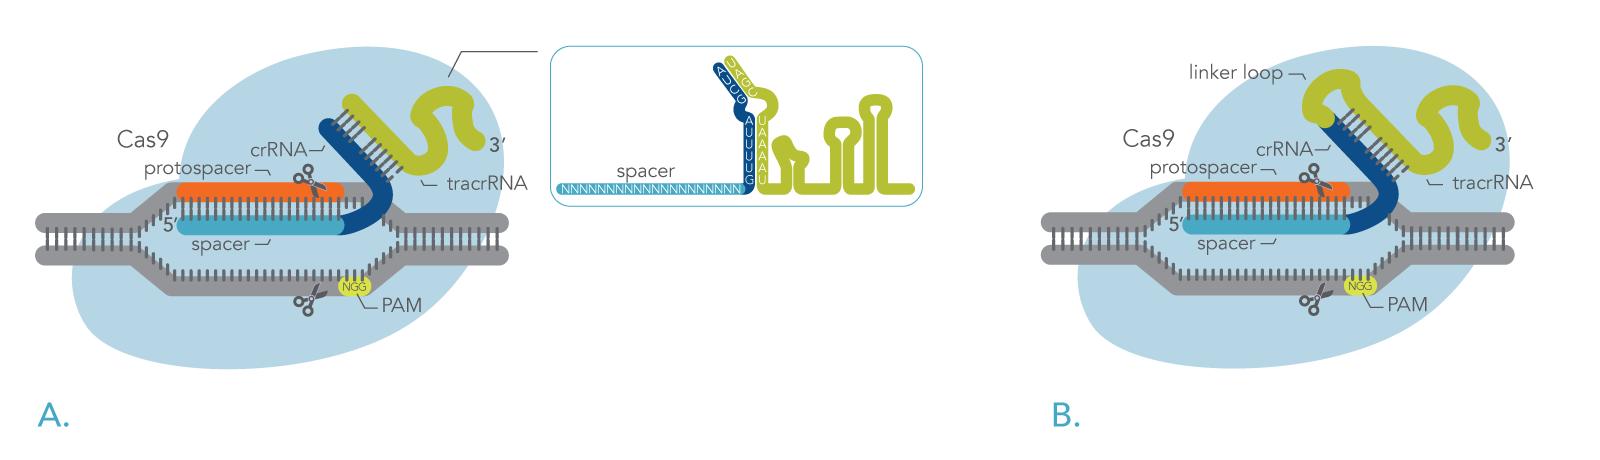 CRISPR Cas9 creates double-strand breaks in genomic DNA